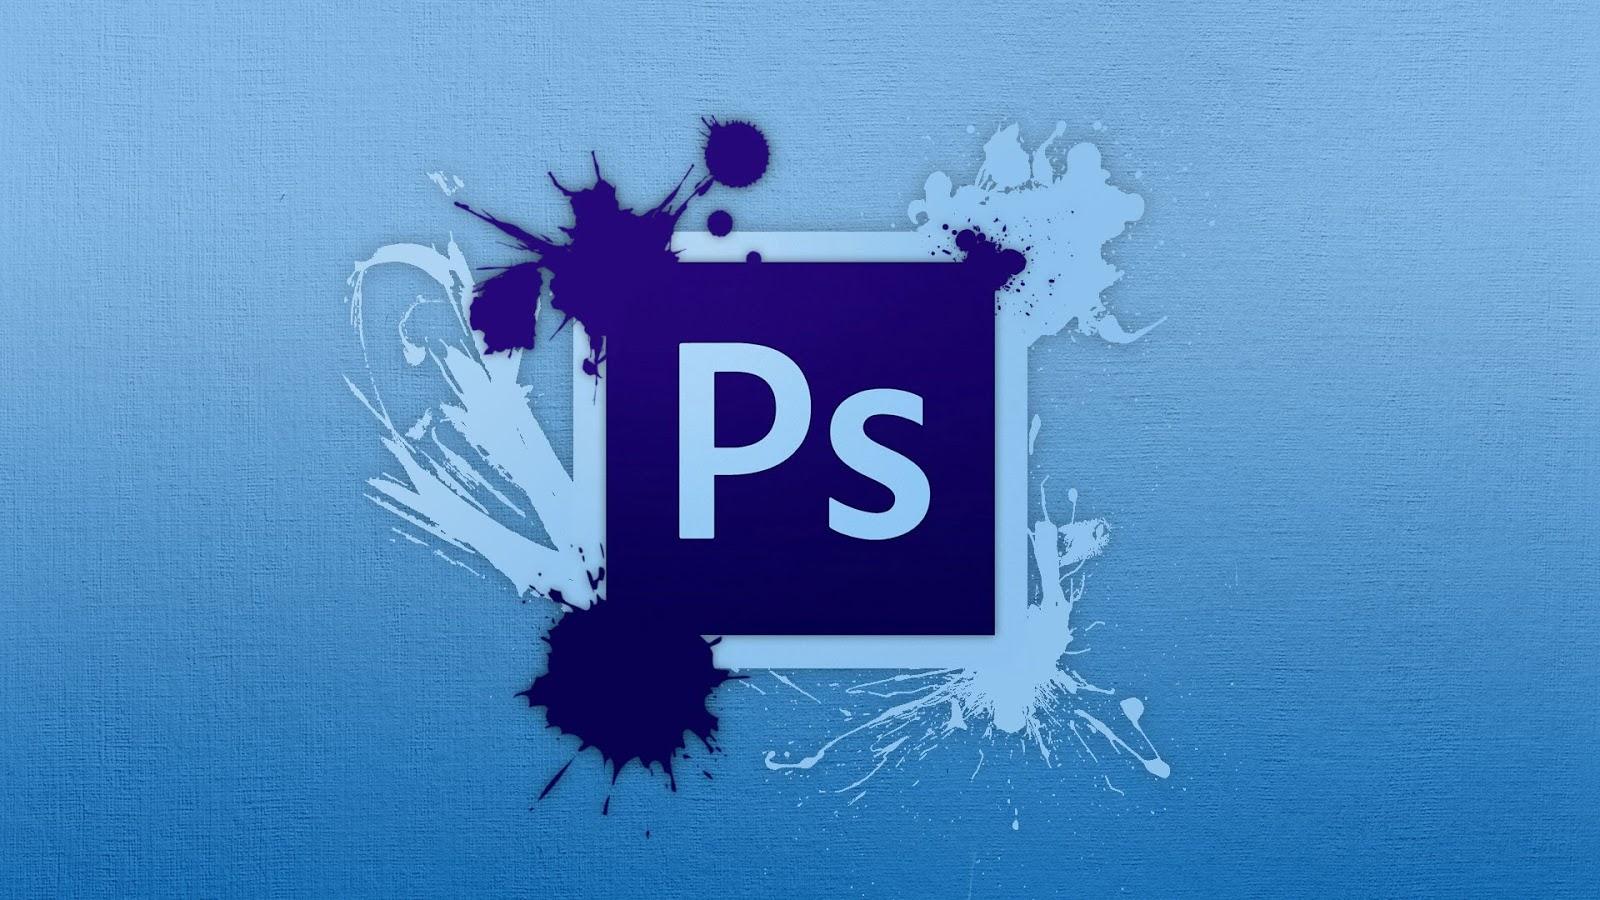 Macam dan Fungsi Tool Tool Pada Photoshop